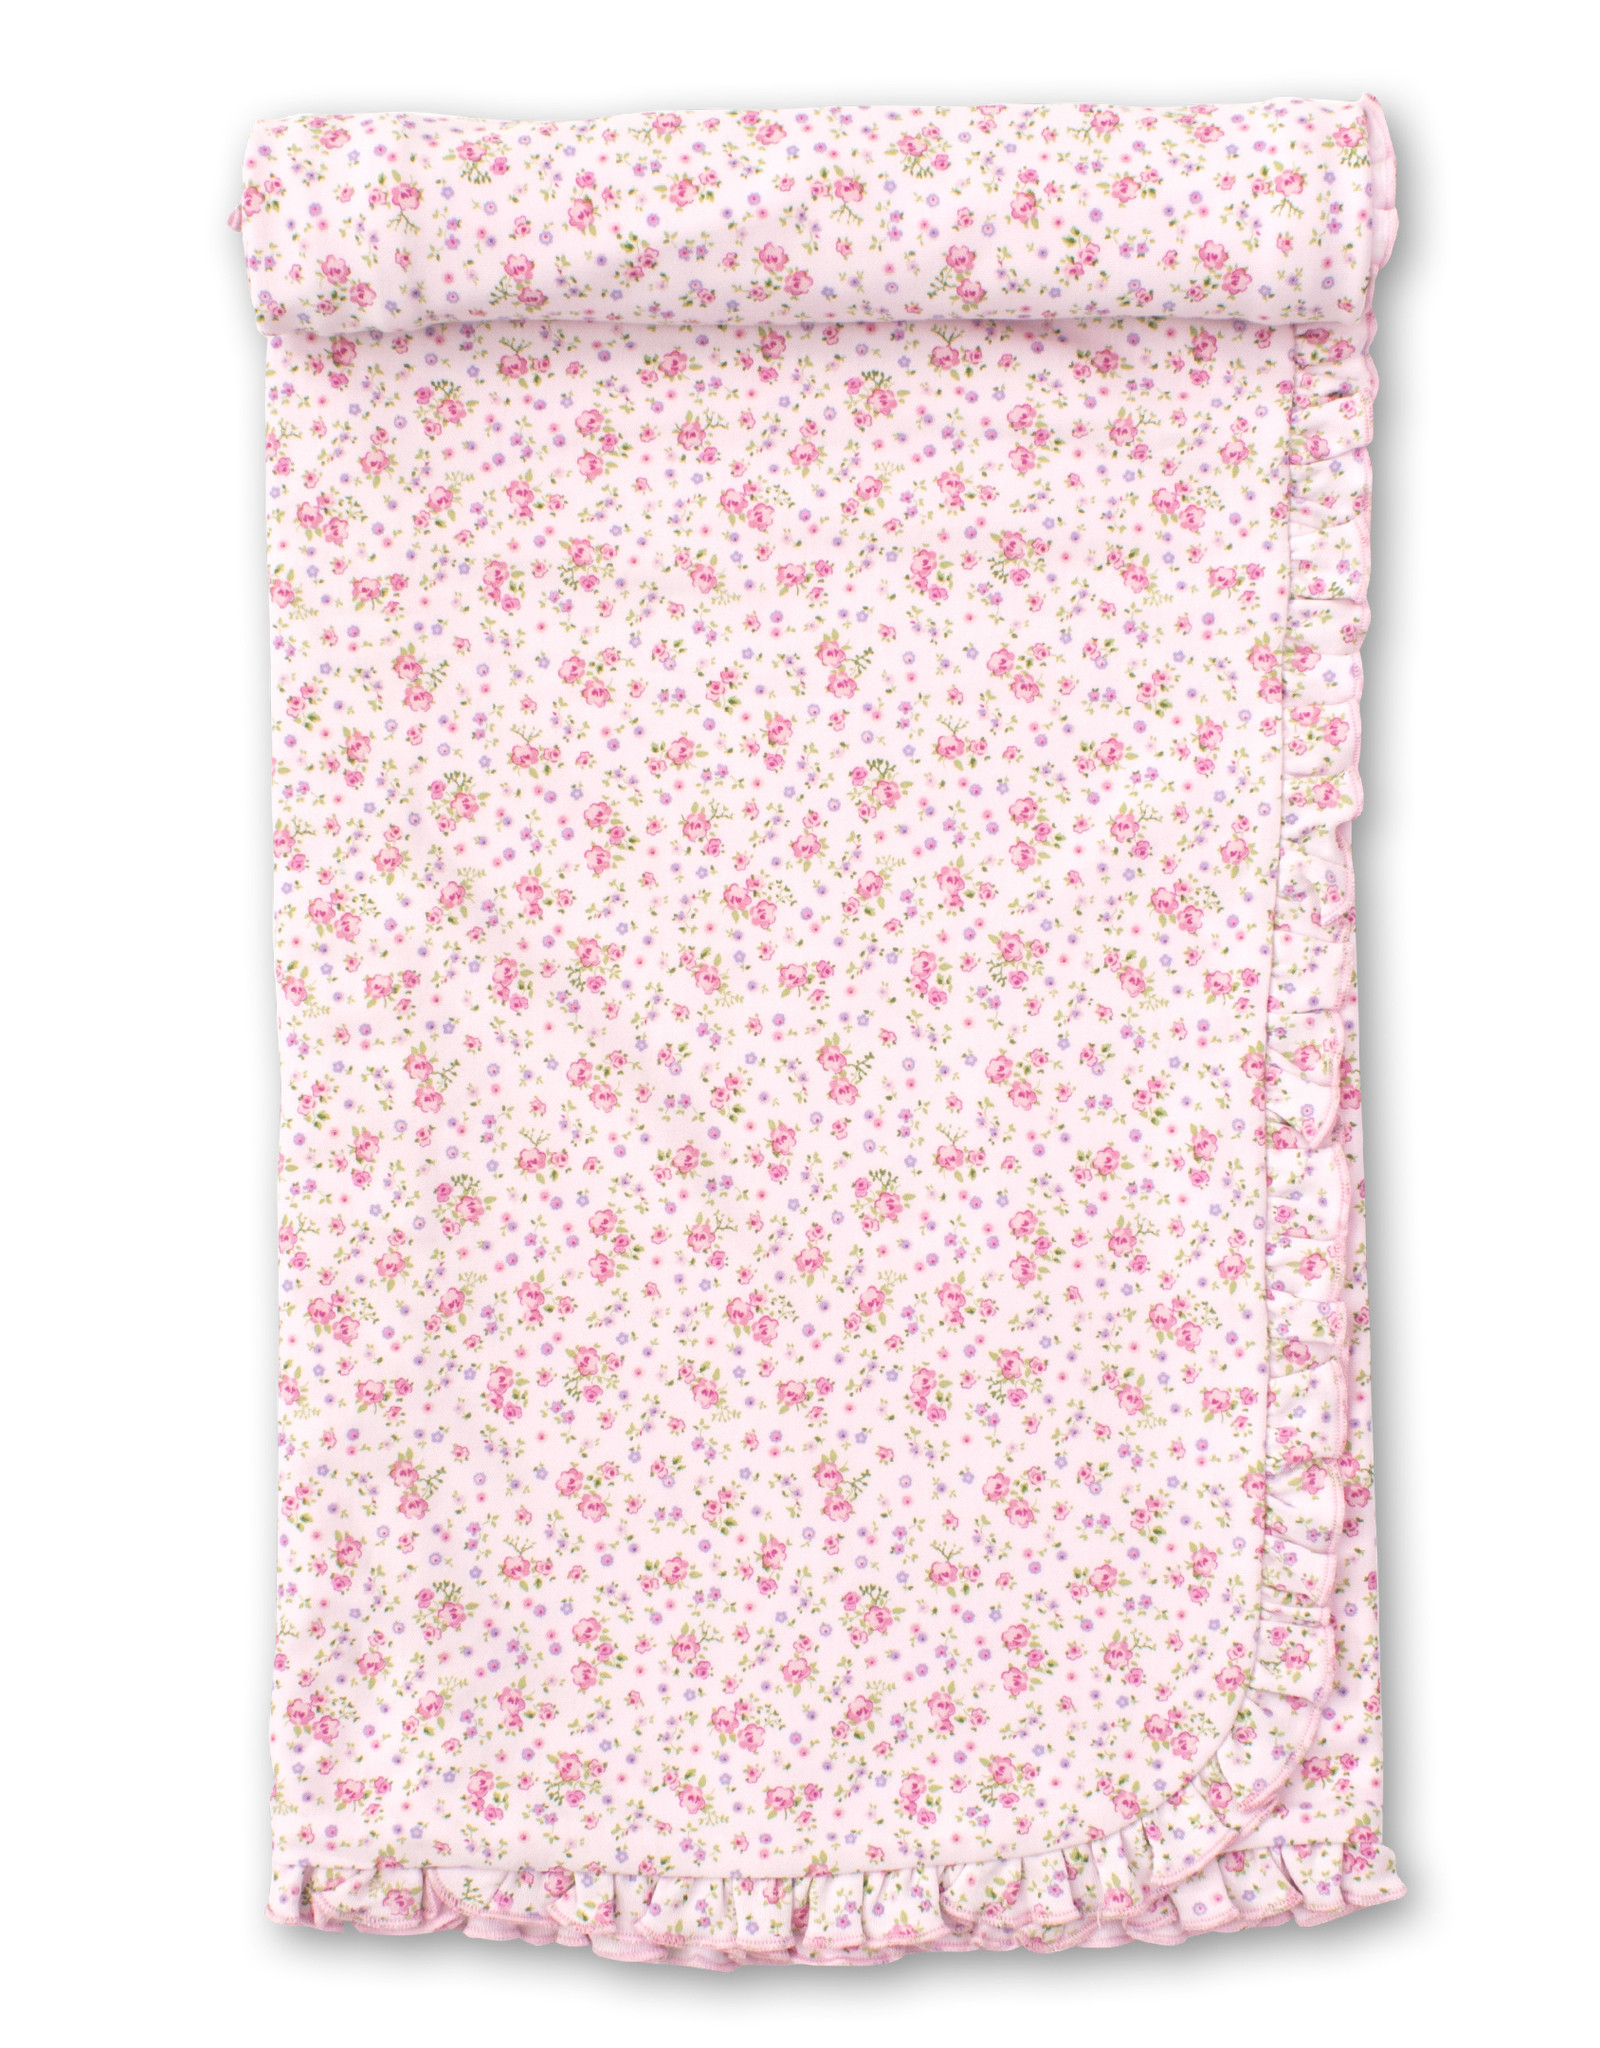 KissyKissy Blanket Dusty Rose Print Kissy Kissy KG704099O